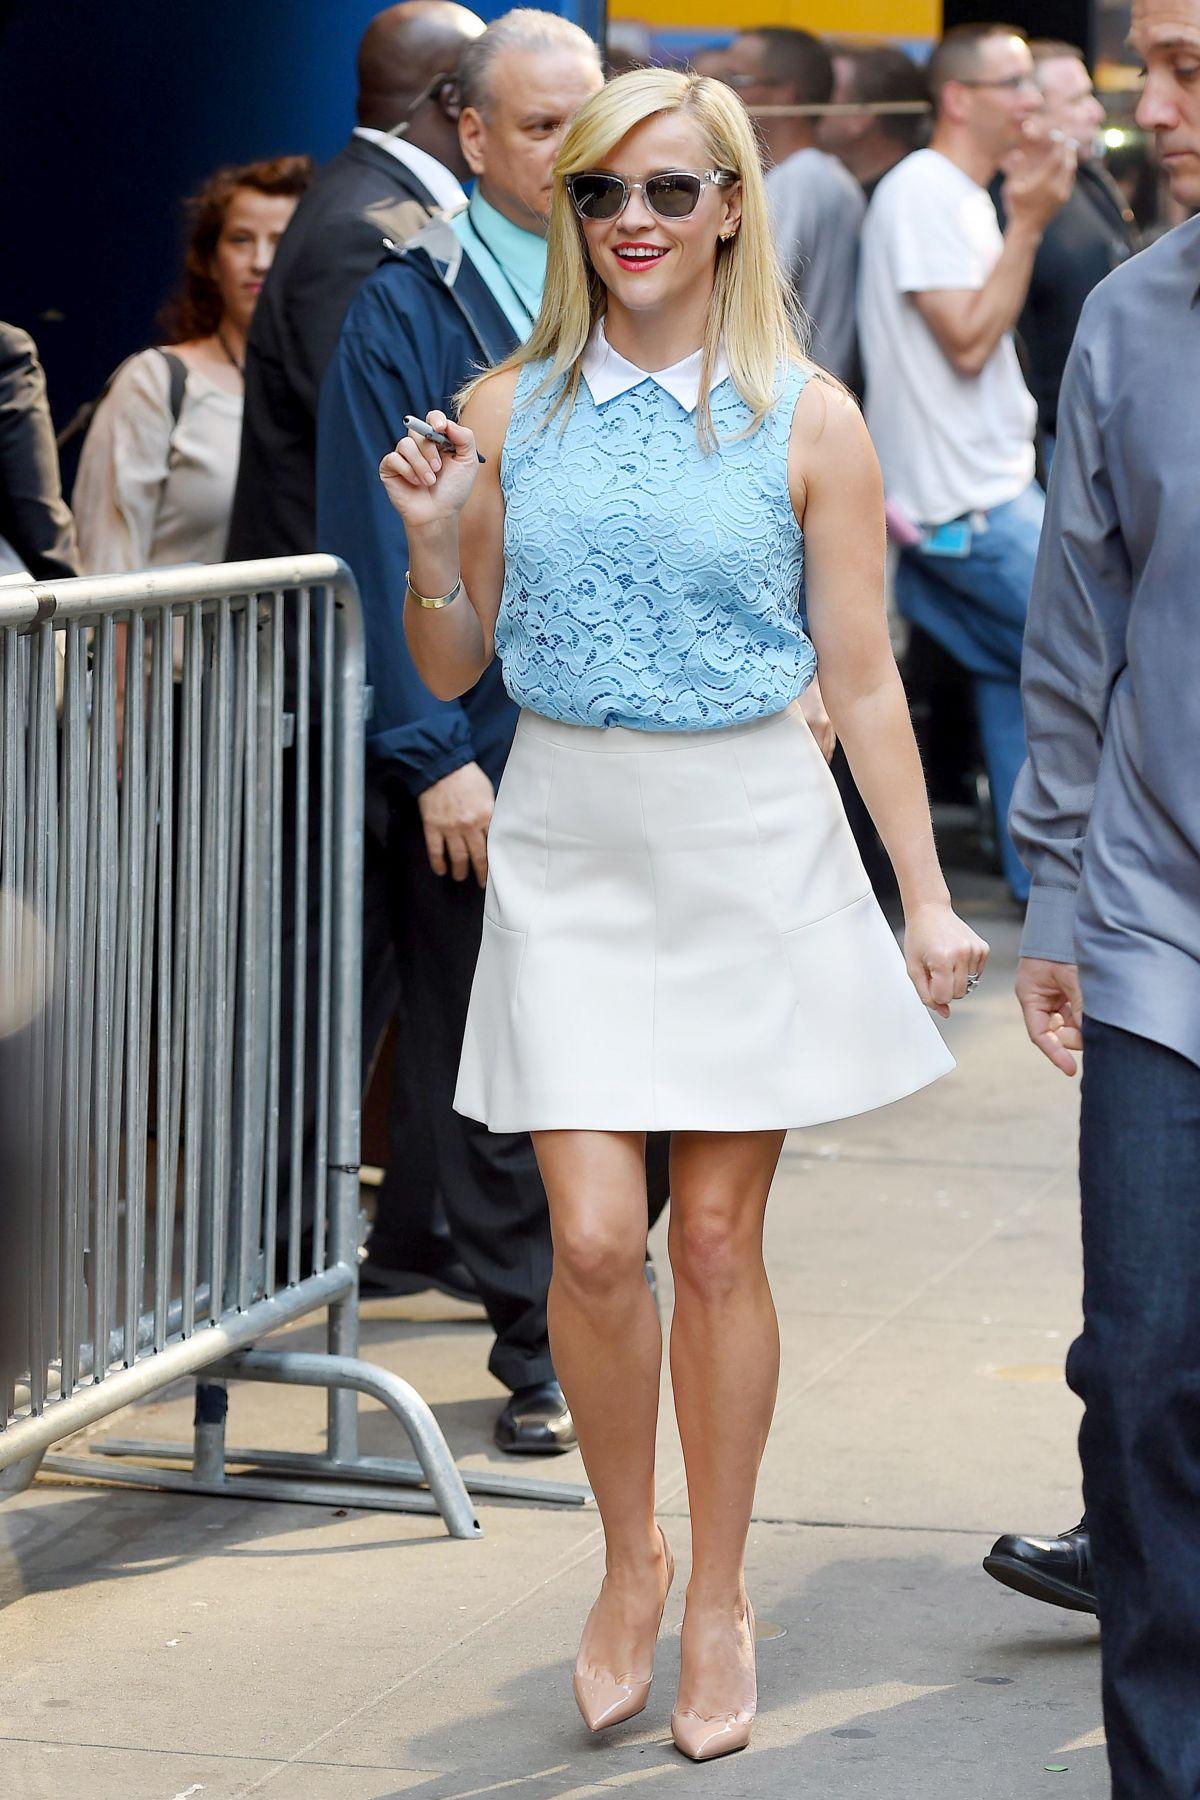 Good Morning America Latest News : Reese witherspoon at good morning america in new york